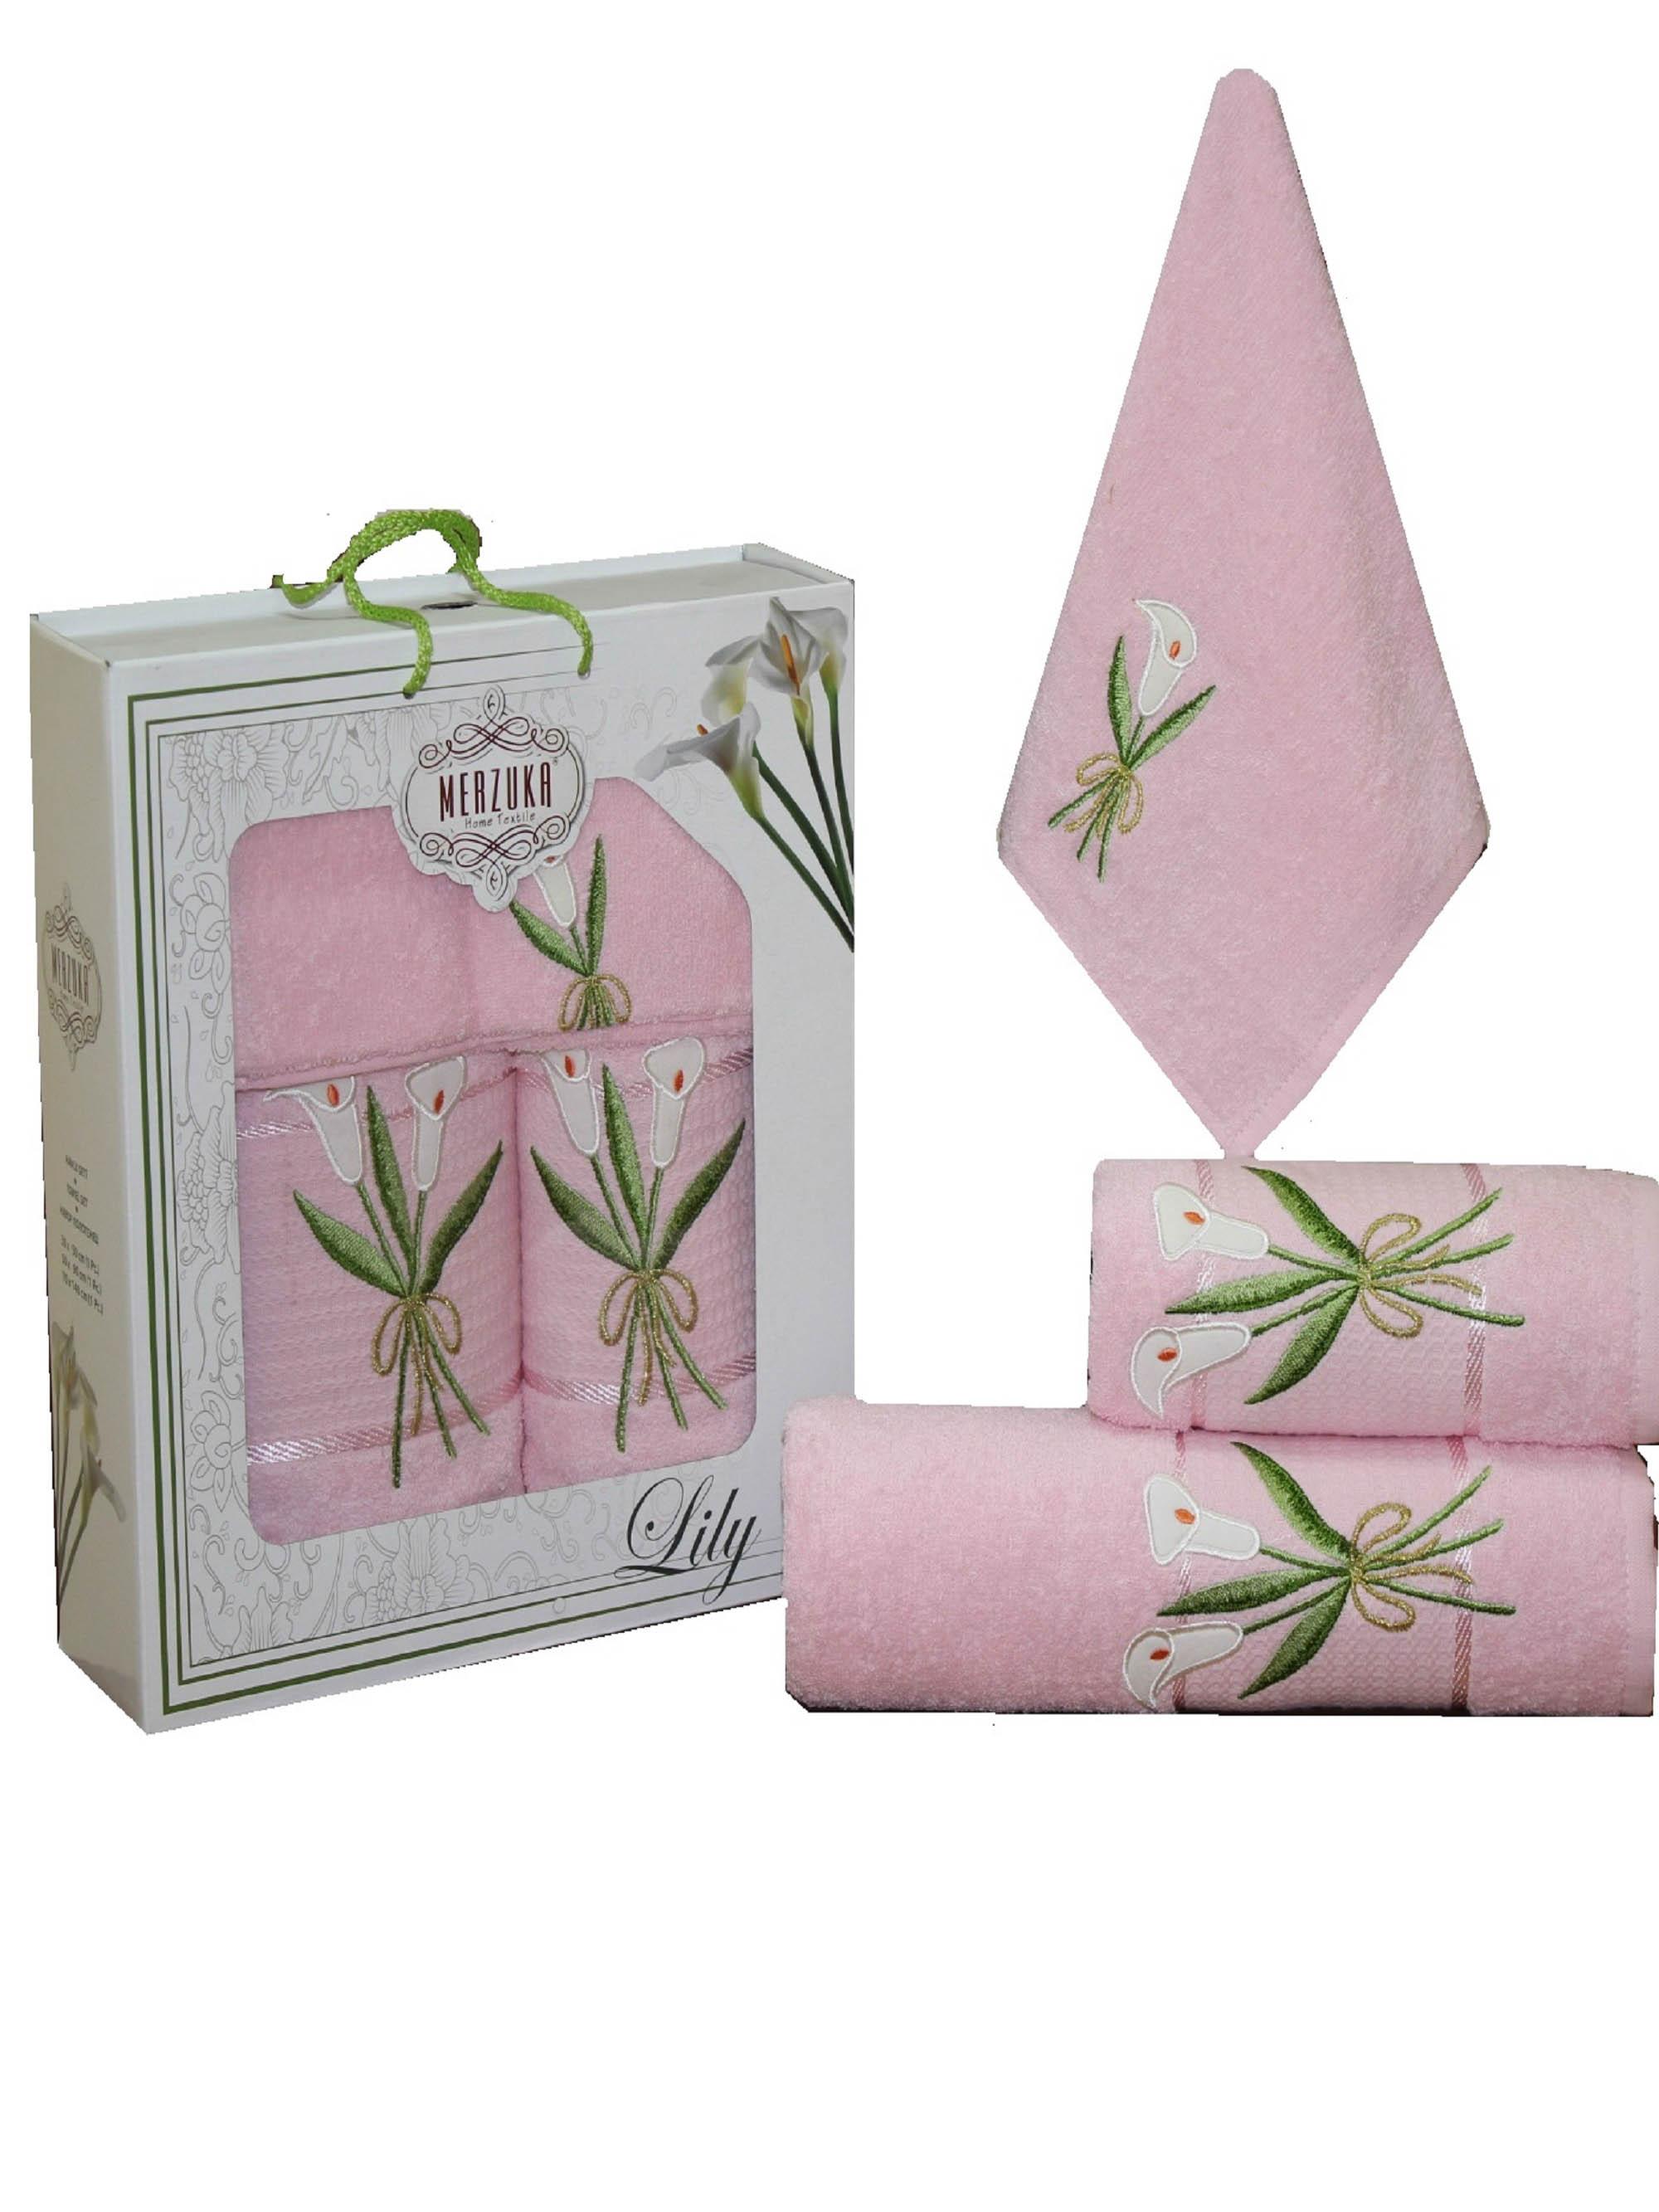 Полотенца Oran Merzuka Набор из 3 полотенец Zambak Цвет: Розовый набор из 3 полотенец merzuka sakura 50х90 2 70х140 8432 оранжевый